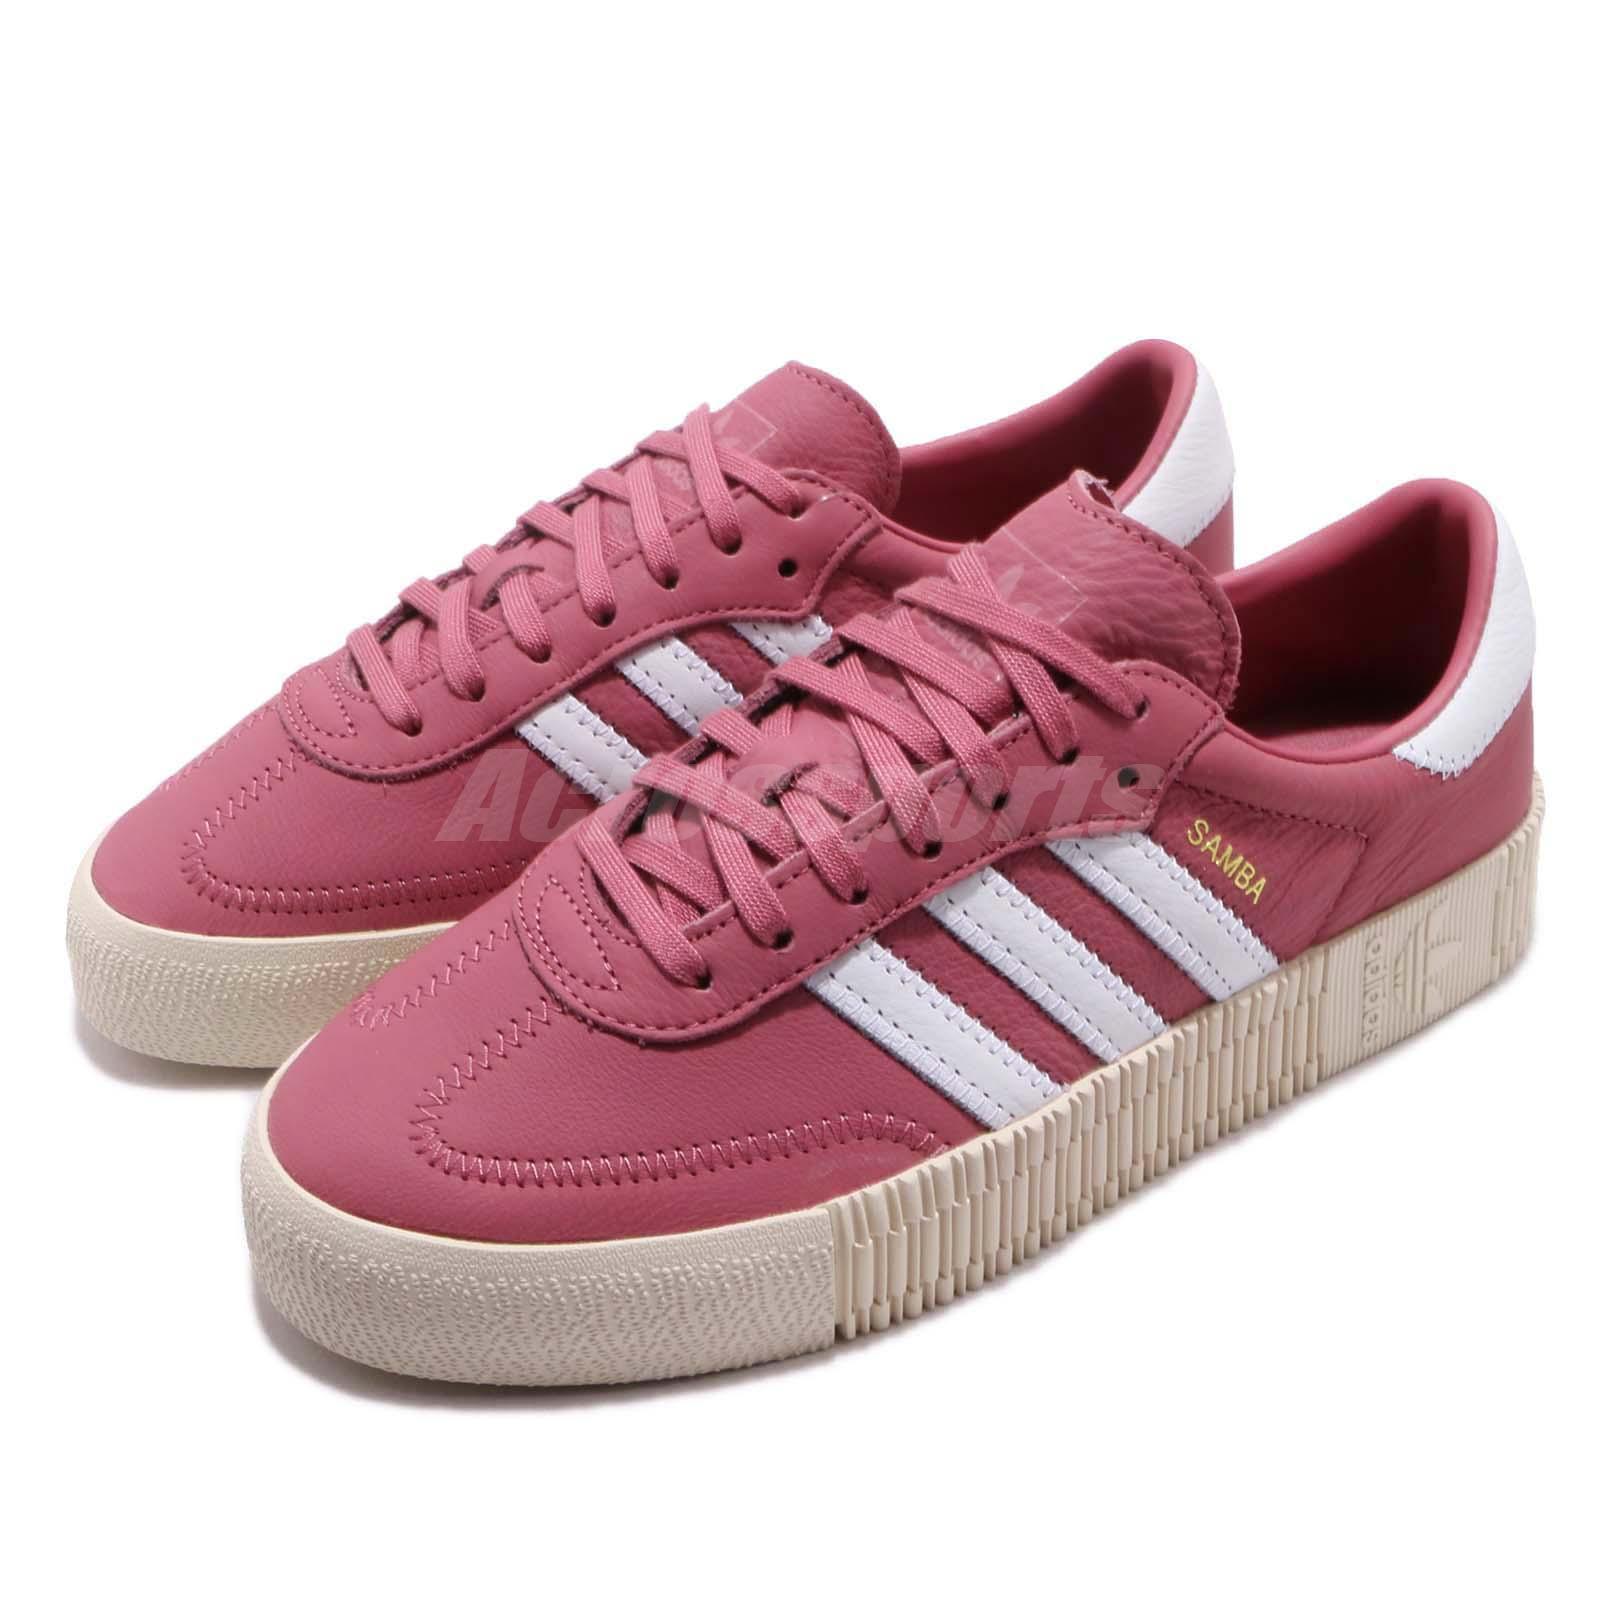 eabfa72c133 Details about adidas Originals Sambarose W Trace Maroon White Women Platform  Shoes B28161